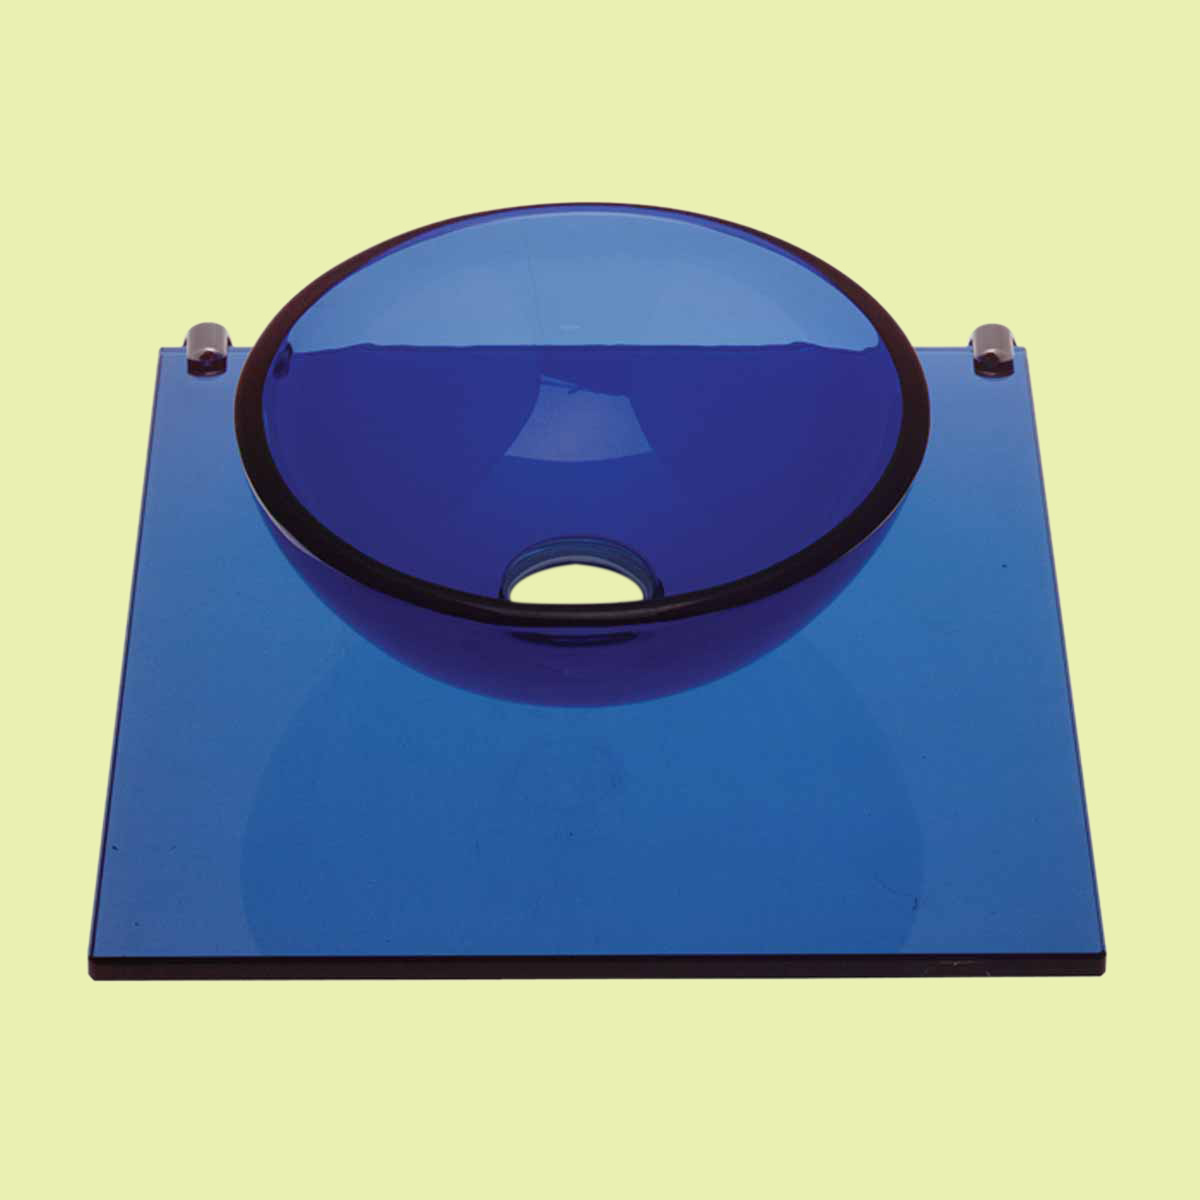 The Renovators Supply Small Wall Mount Blue Glass Sink Bathroom Mini Vessel | Renovator's Supply